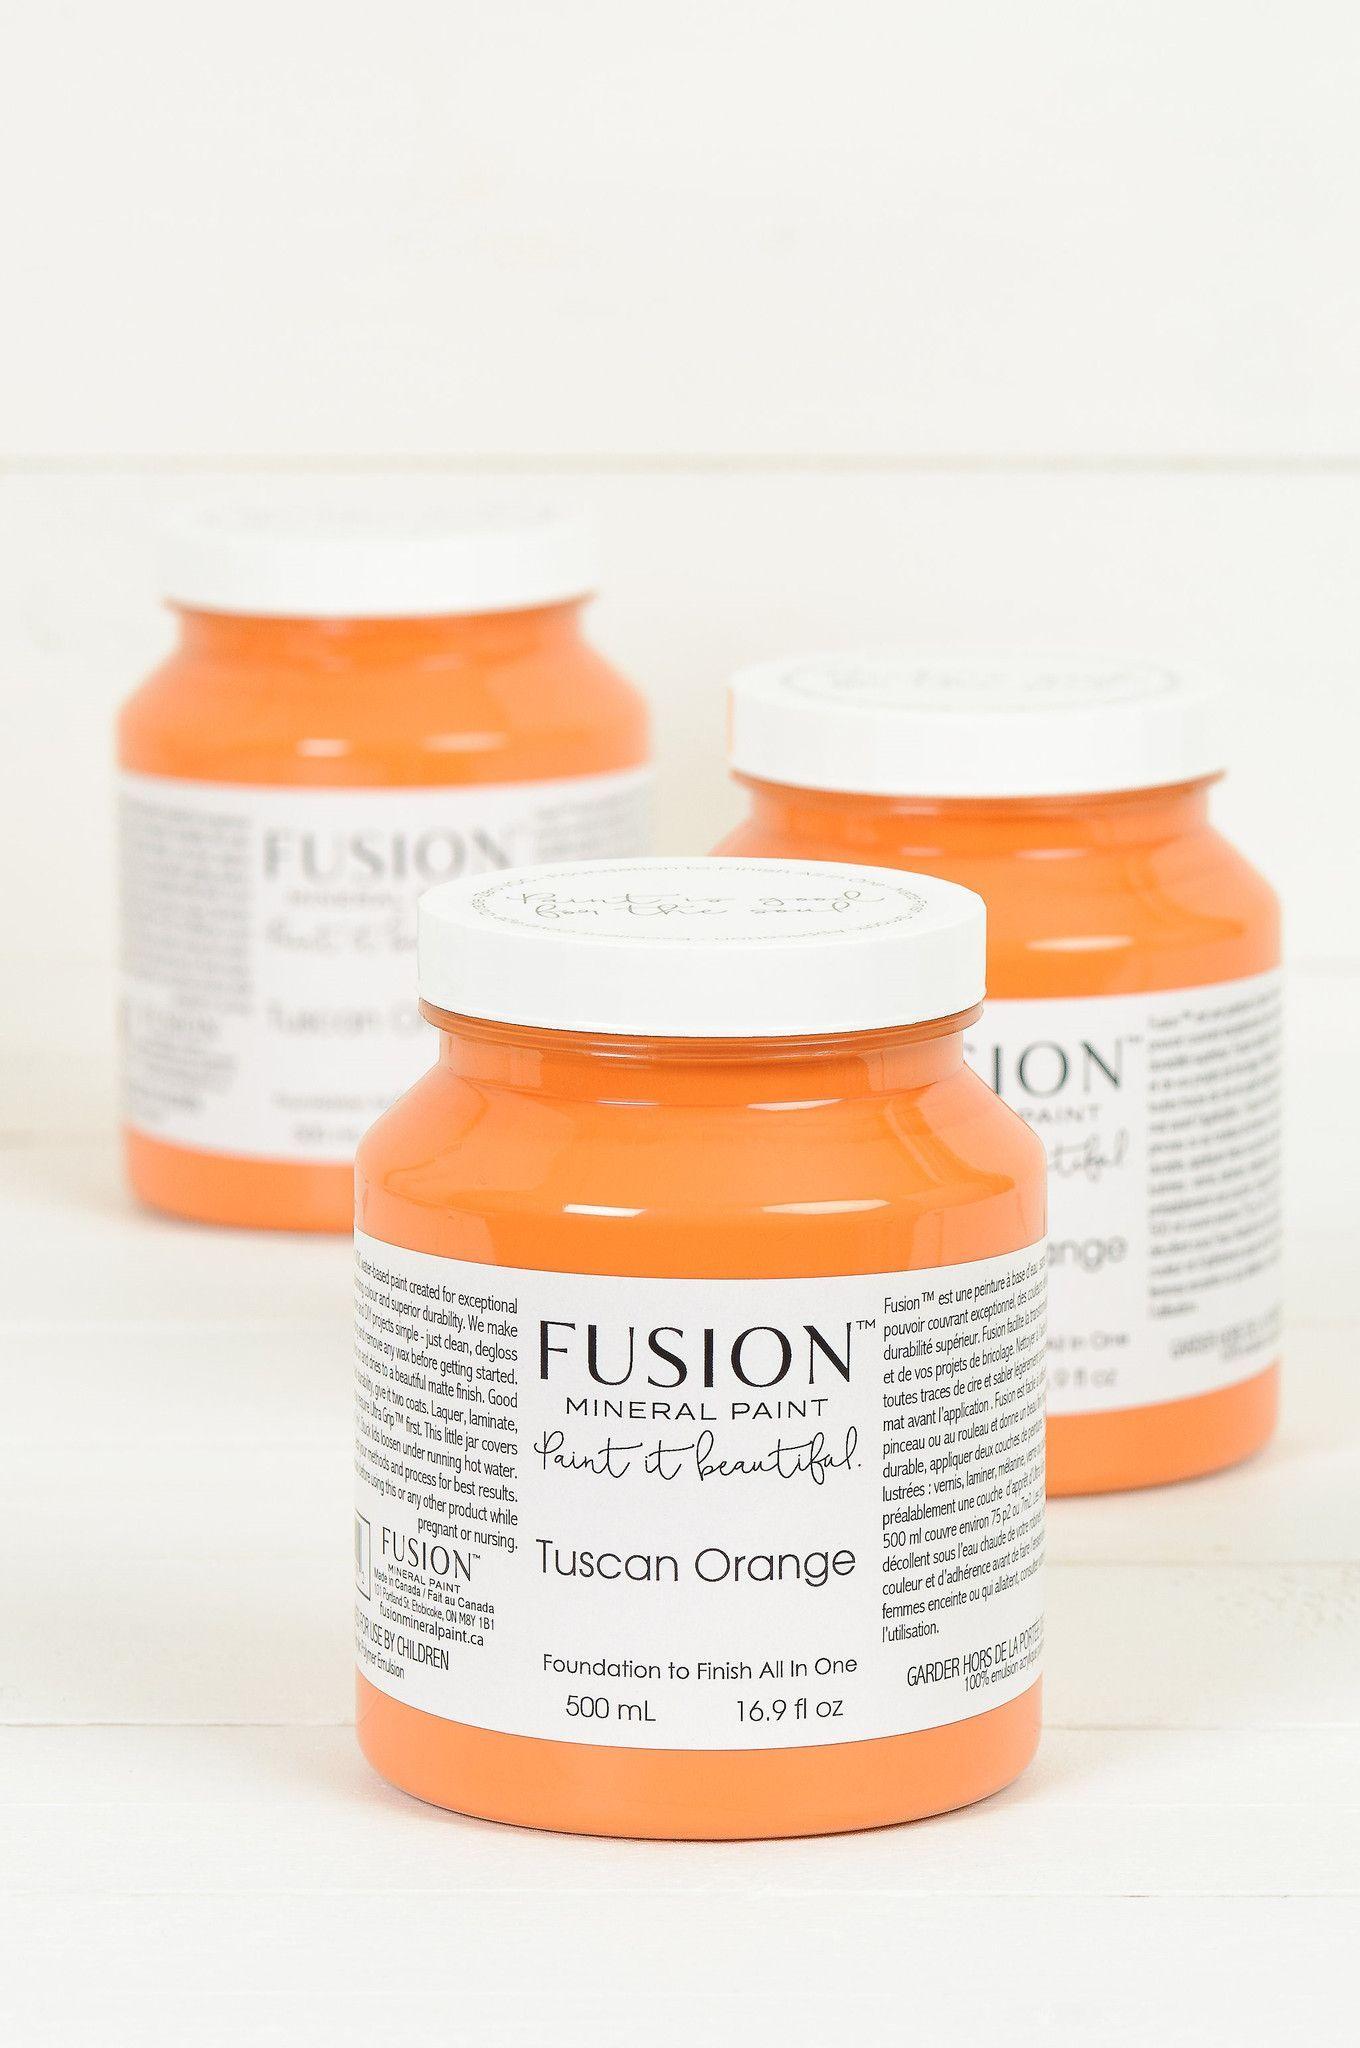 Tuscan Orange Fusion Mineral Paint 500ml Pint